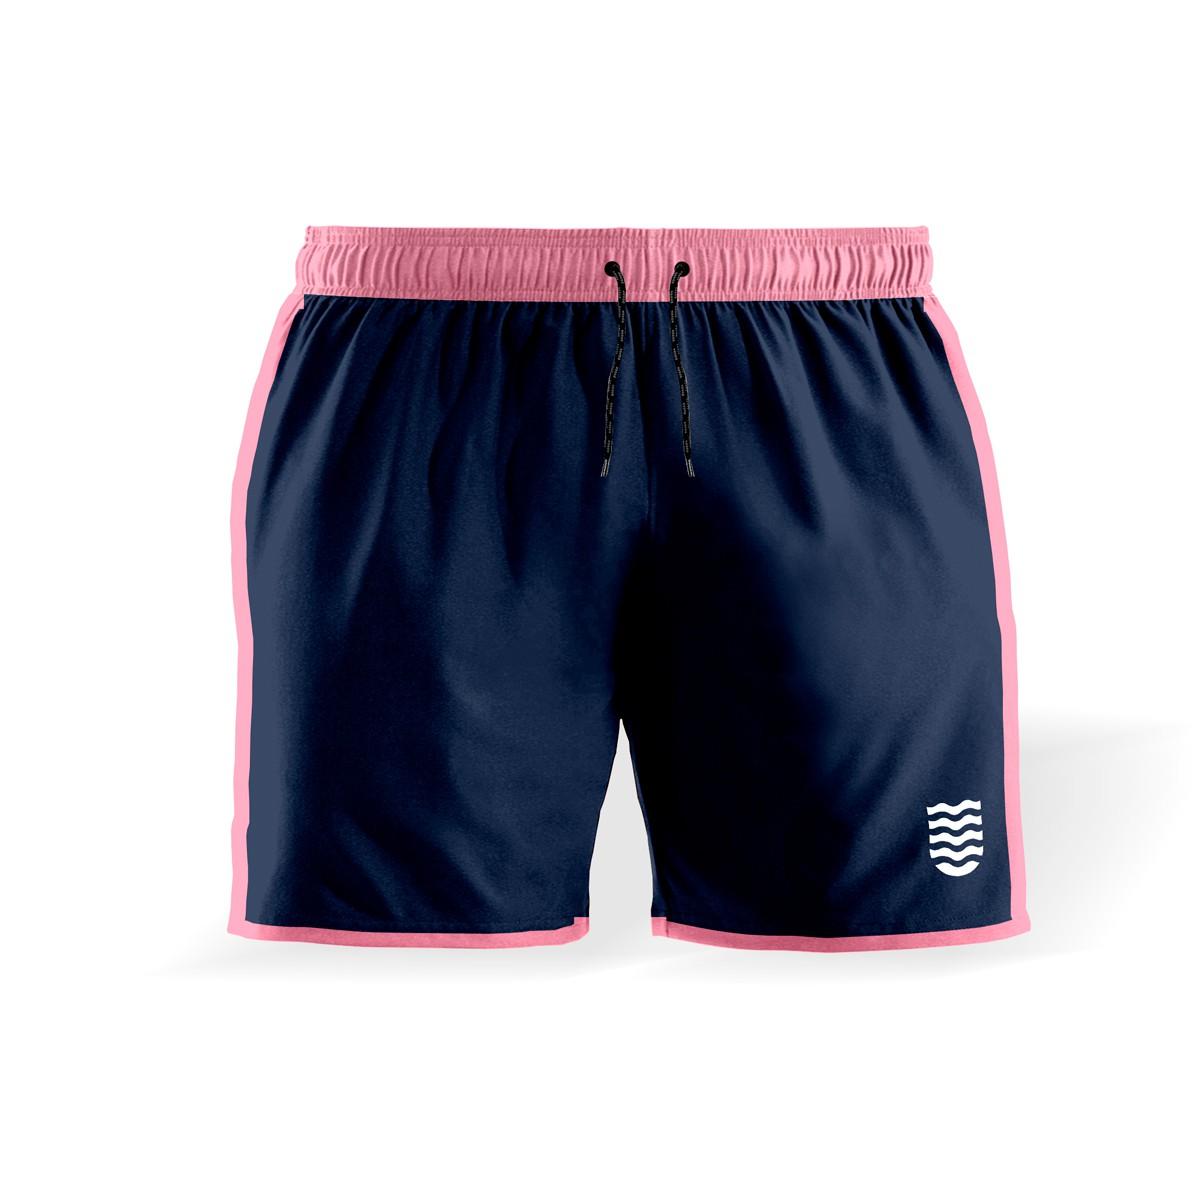 Shorts Masculino Wss Colors DarkOrchid